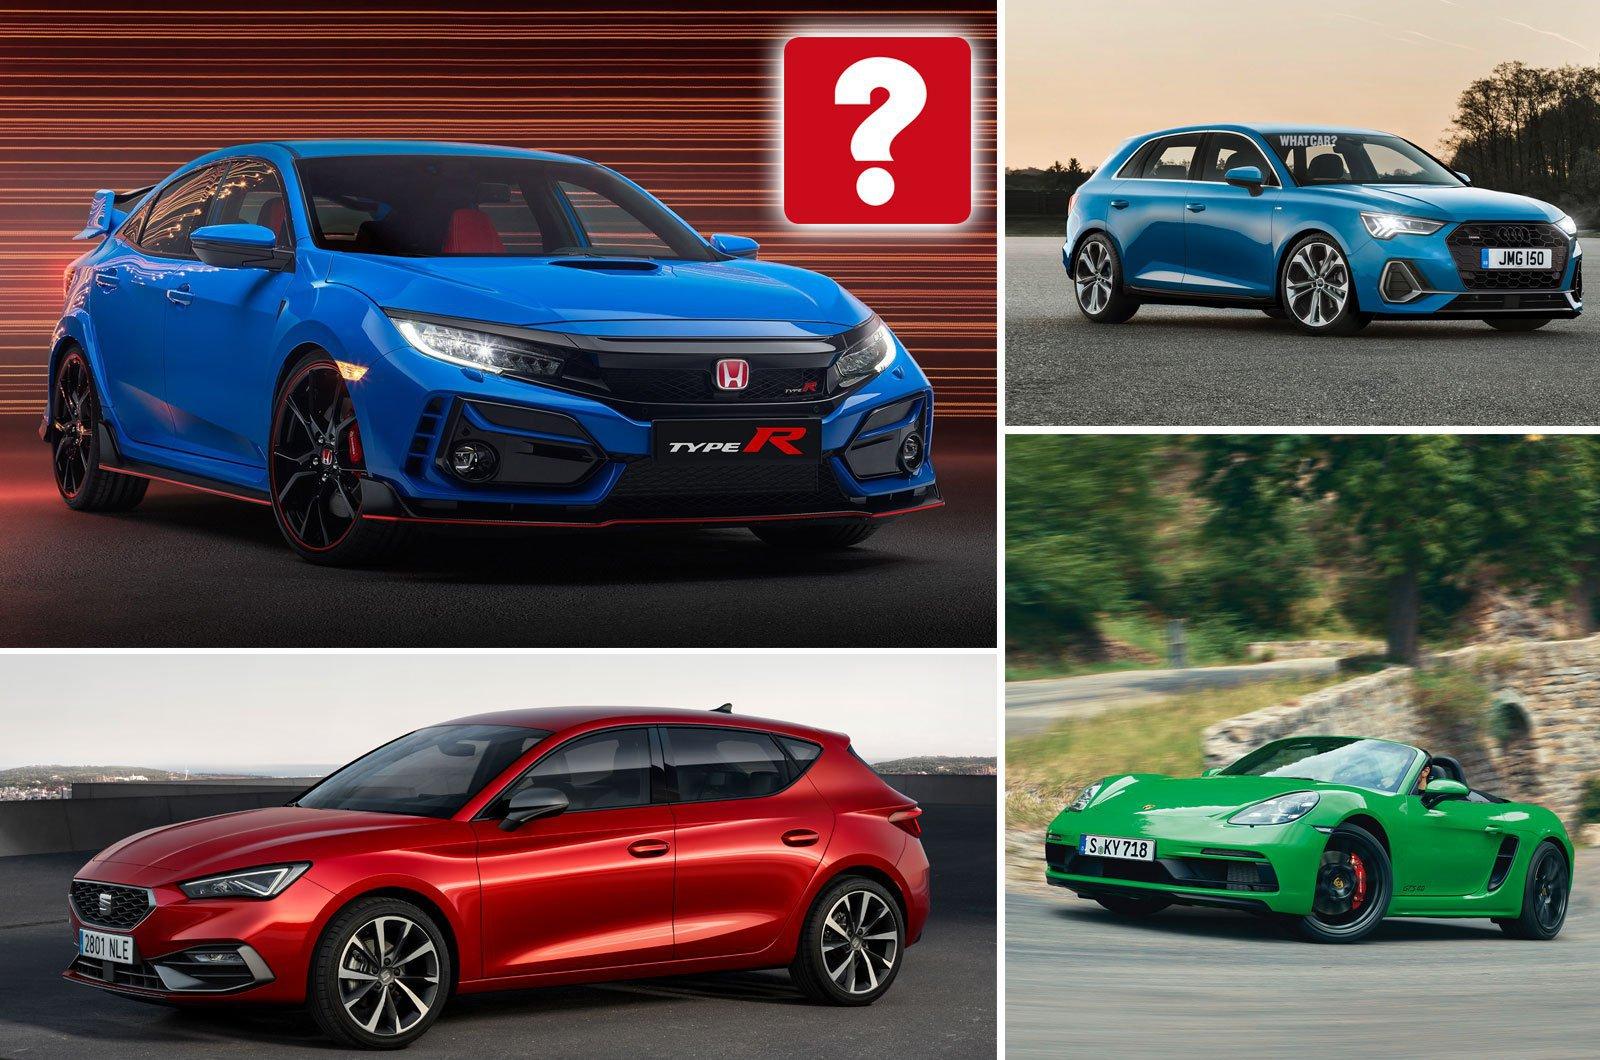 Four car compilation image